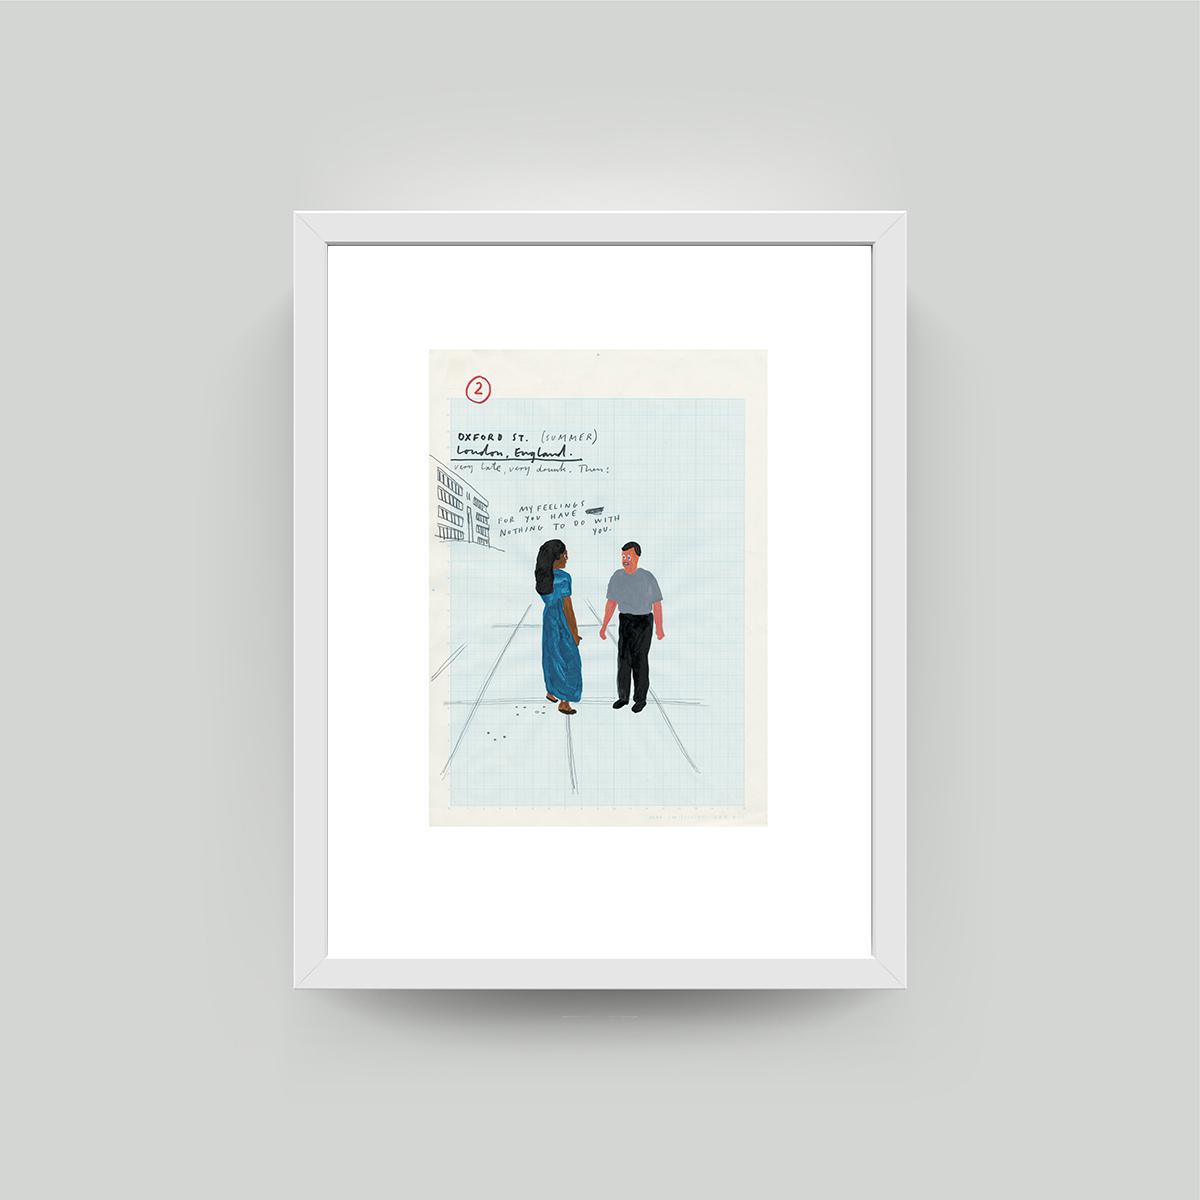 framed paul davis print